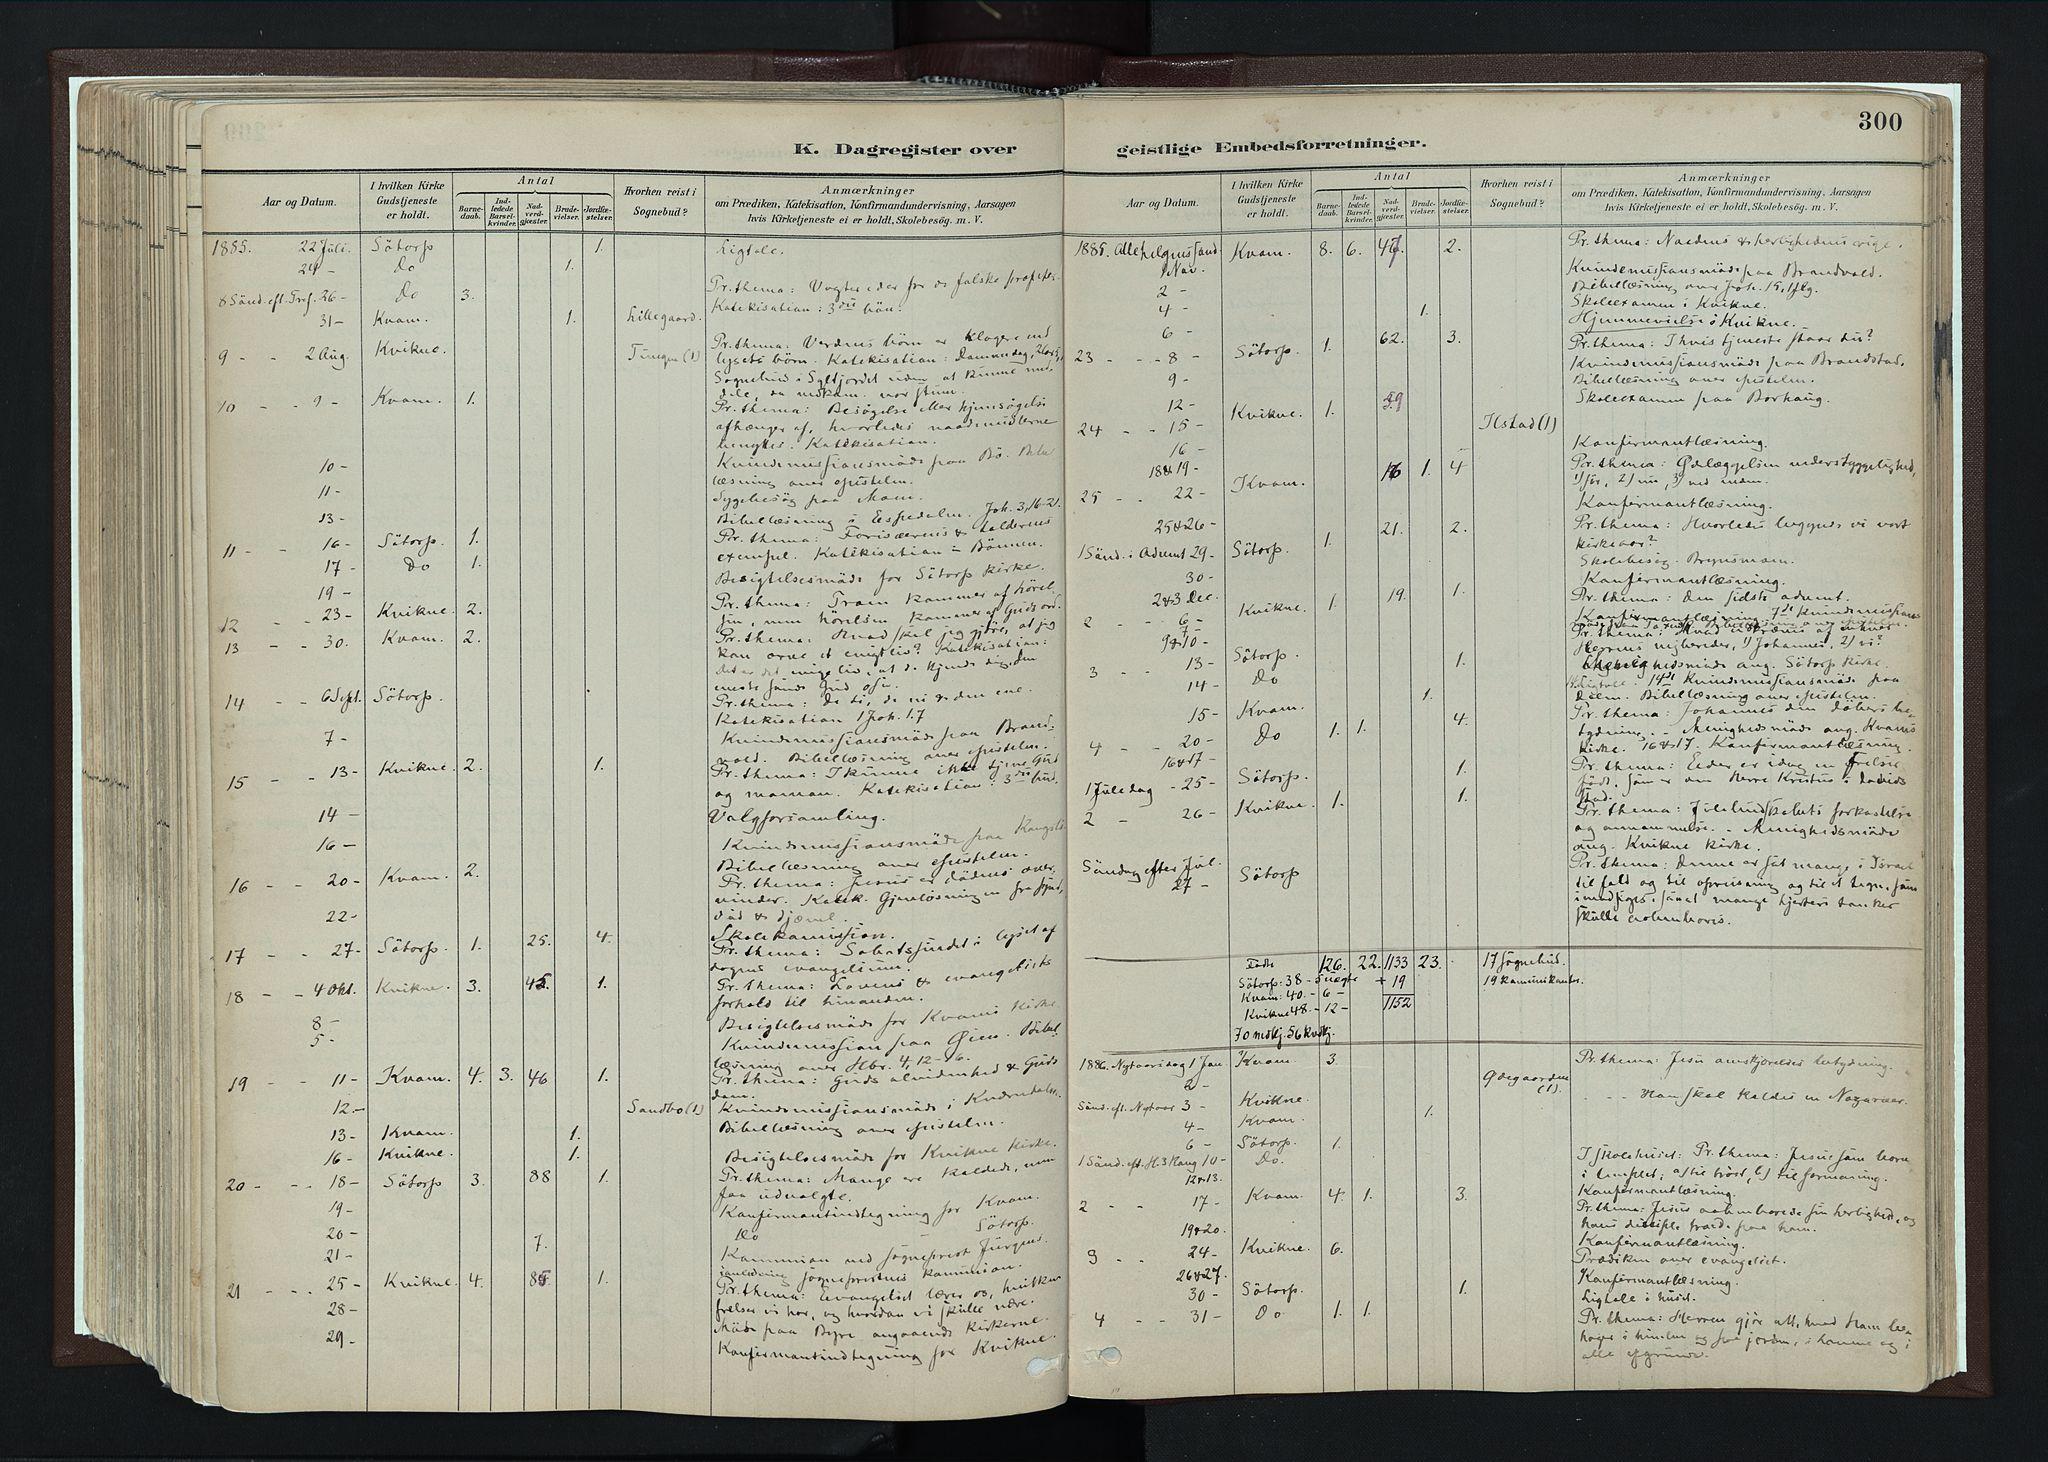 SAH, Nord-Fron prestekontor, Ministerialbok nr. 4, 1884-1914, s. 300